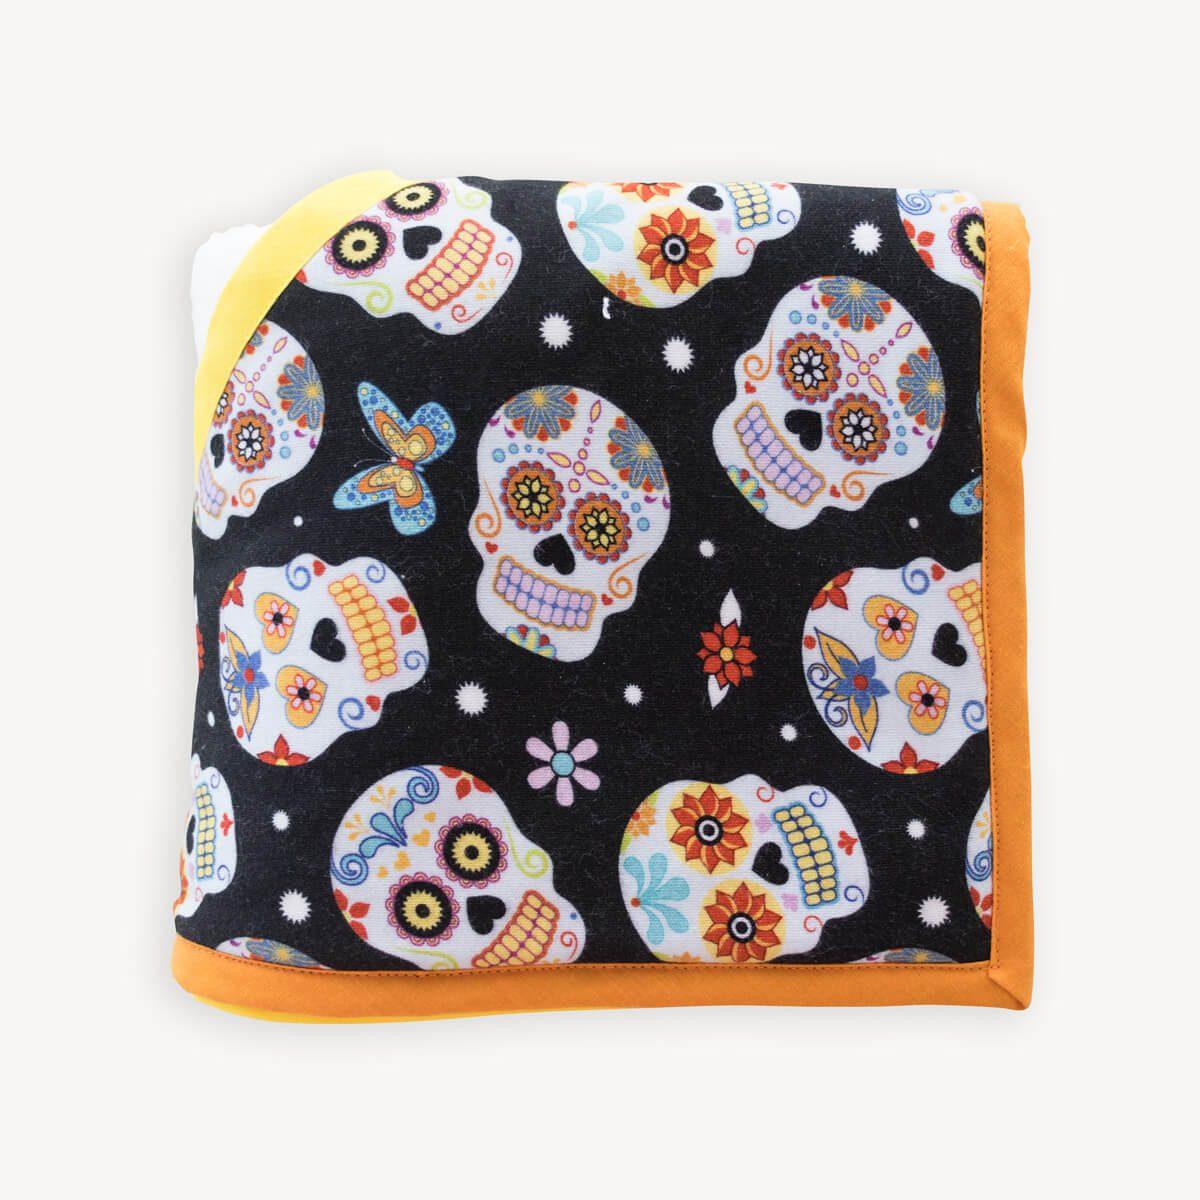 capa de baño de calaveras mexicanas